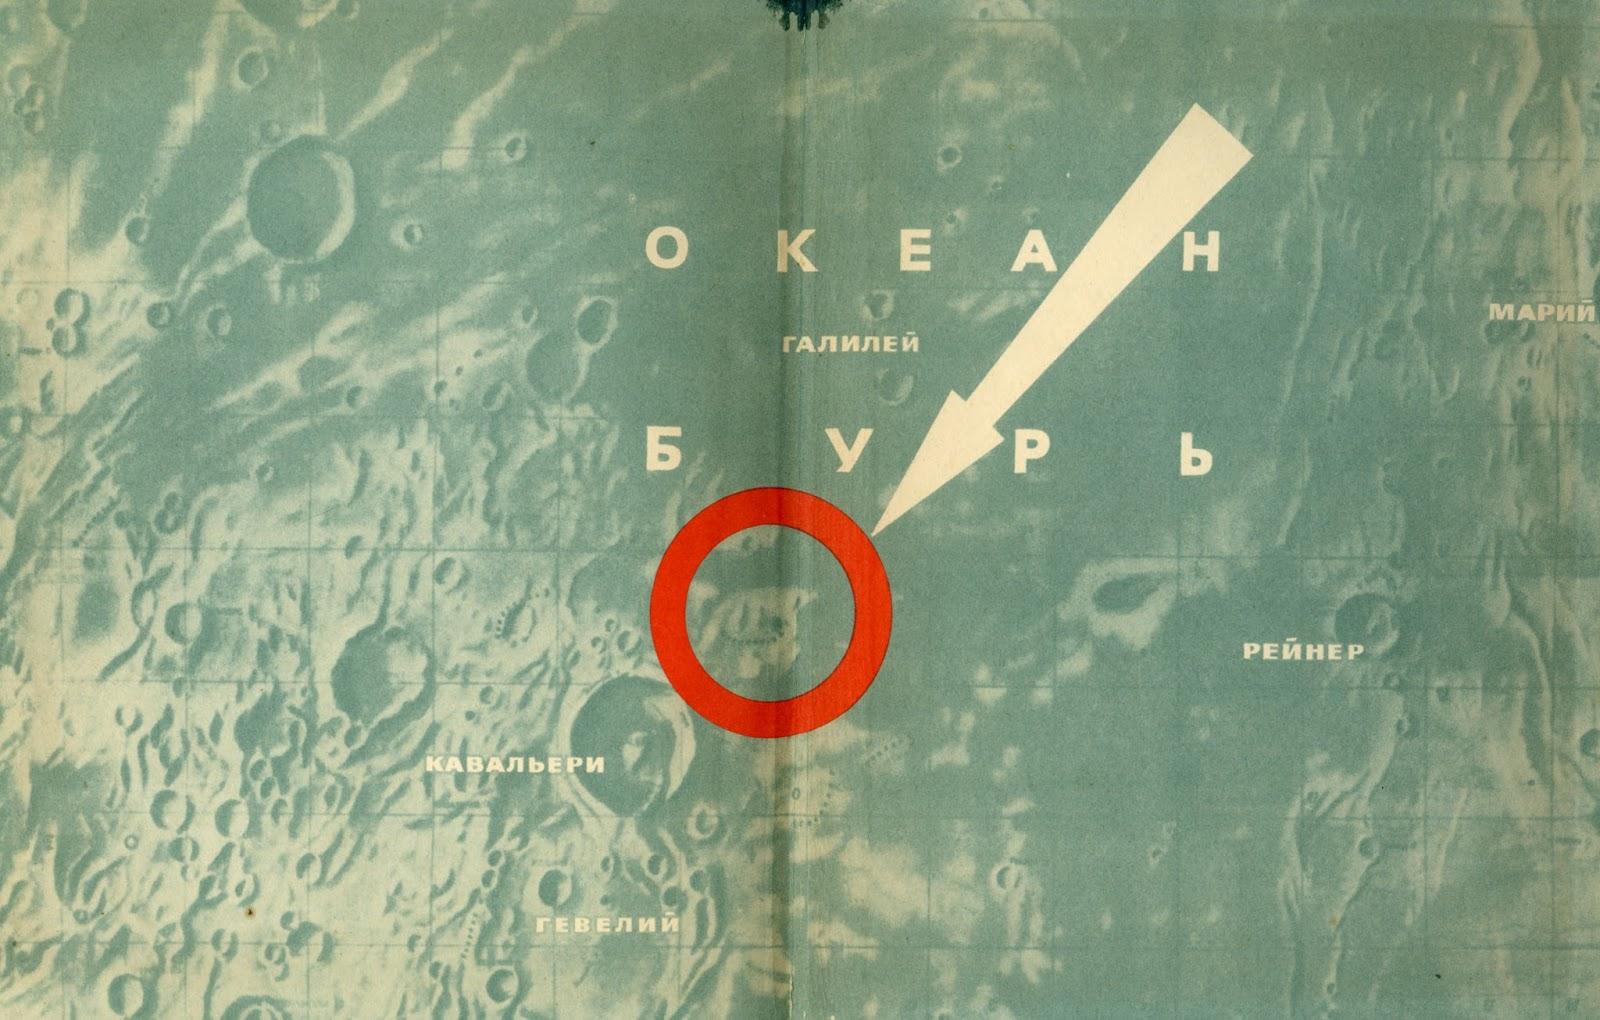 Dreams of Space - Books and Ephemera: Luna 9 (1966)